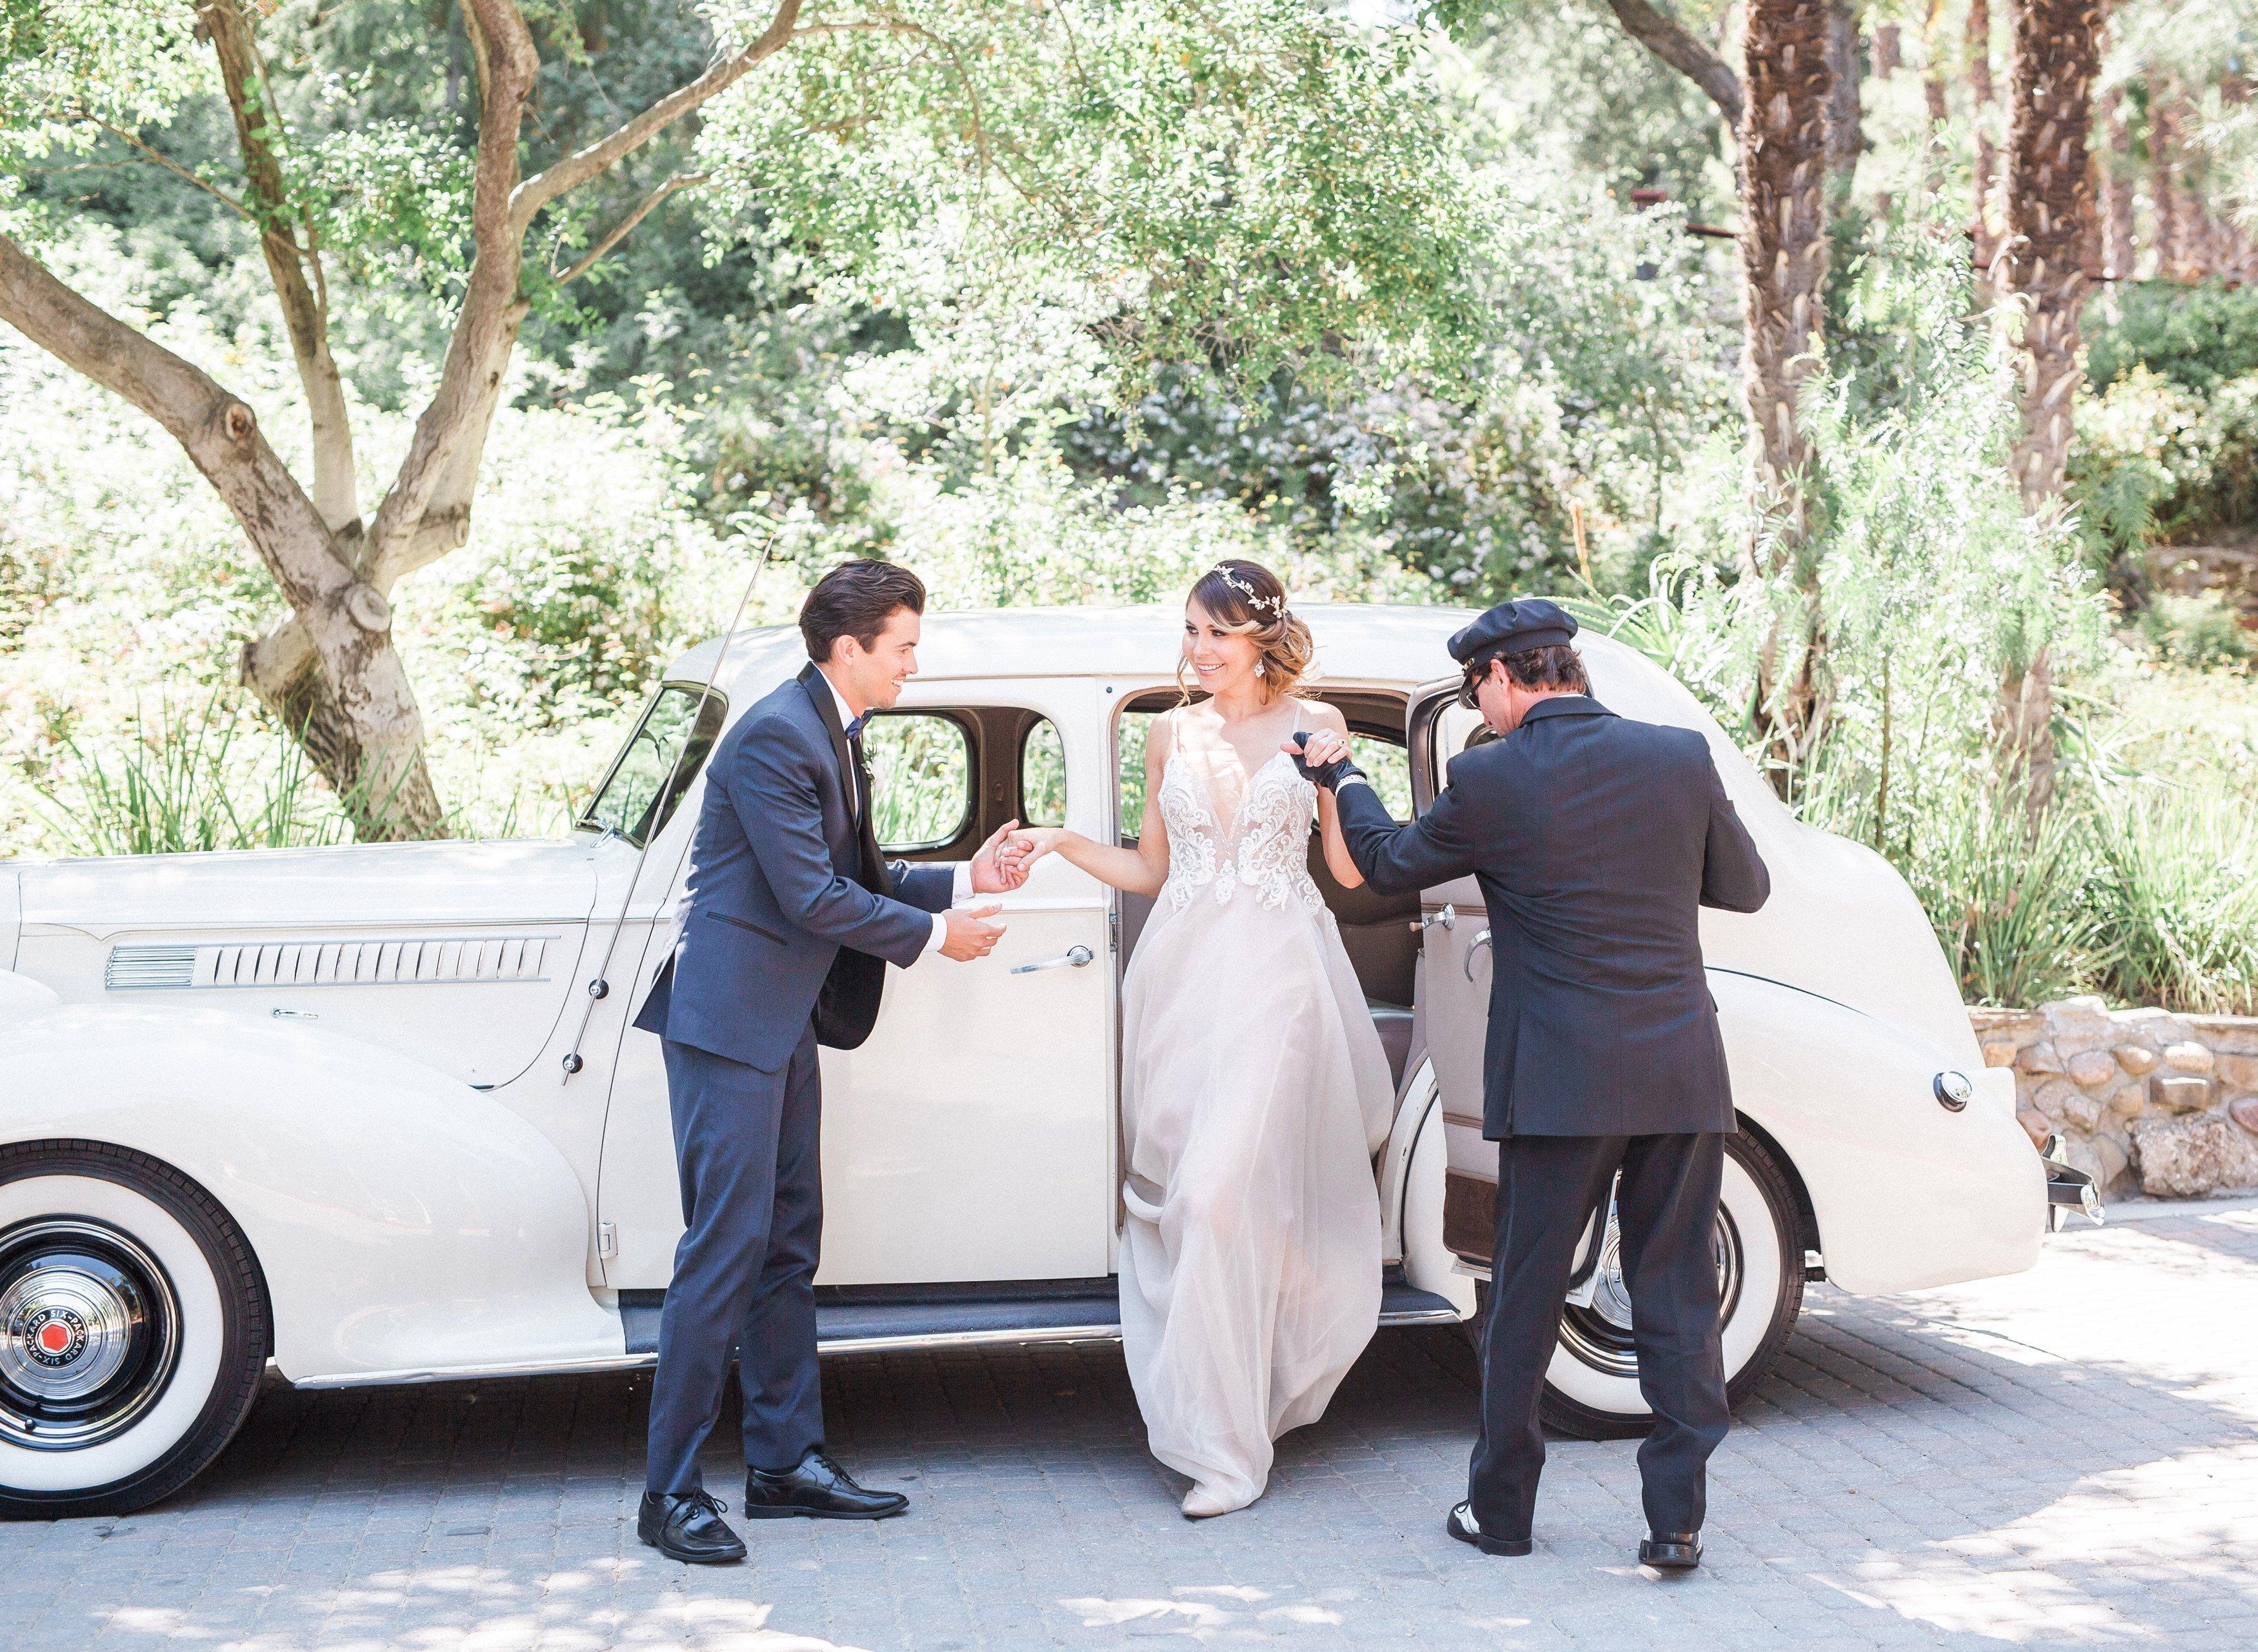 Event Car Rentals, Classic Cars, Vintage Rolls Royce